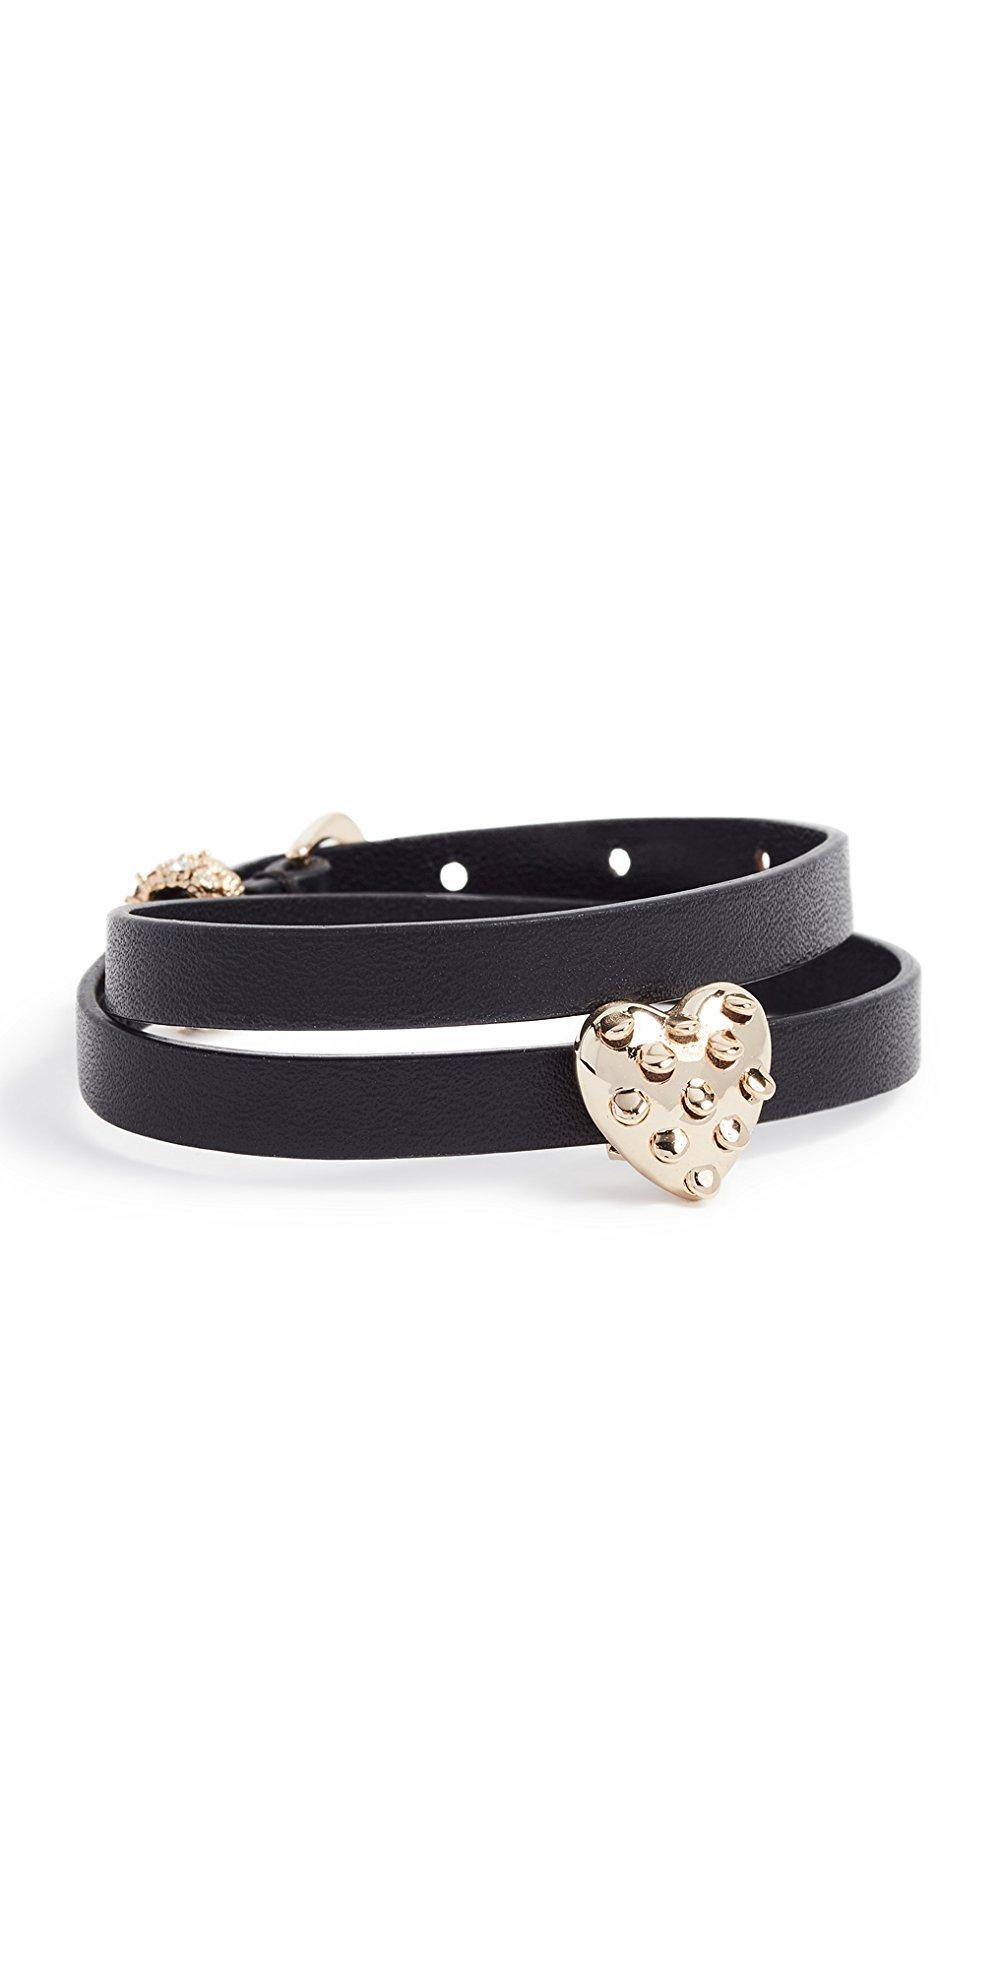 Alexis Bittar Heart Slider Leather Wrap Bracelet